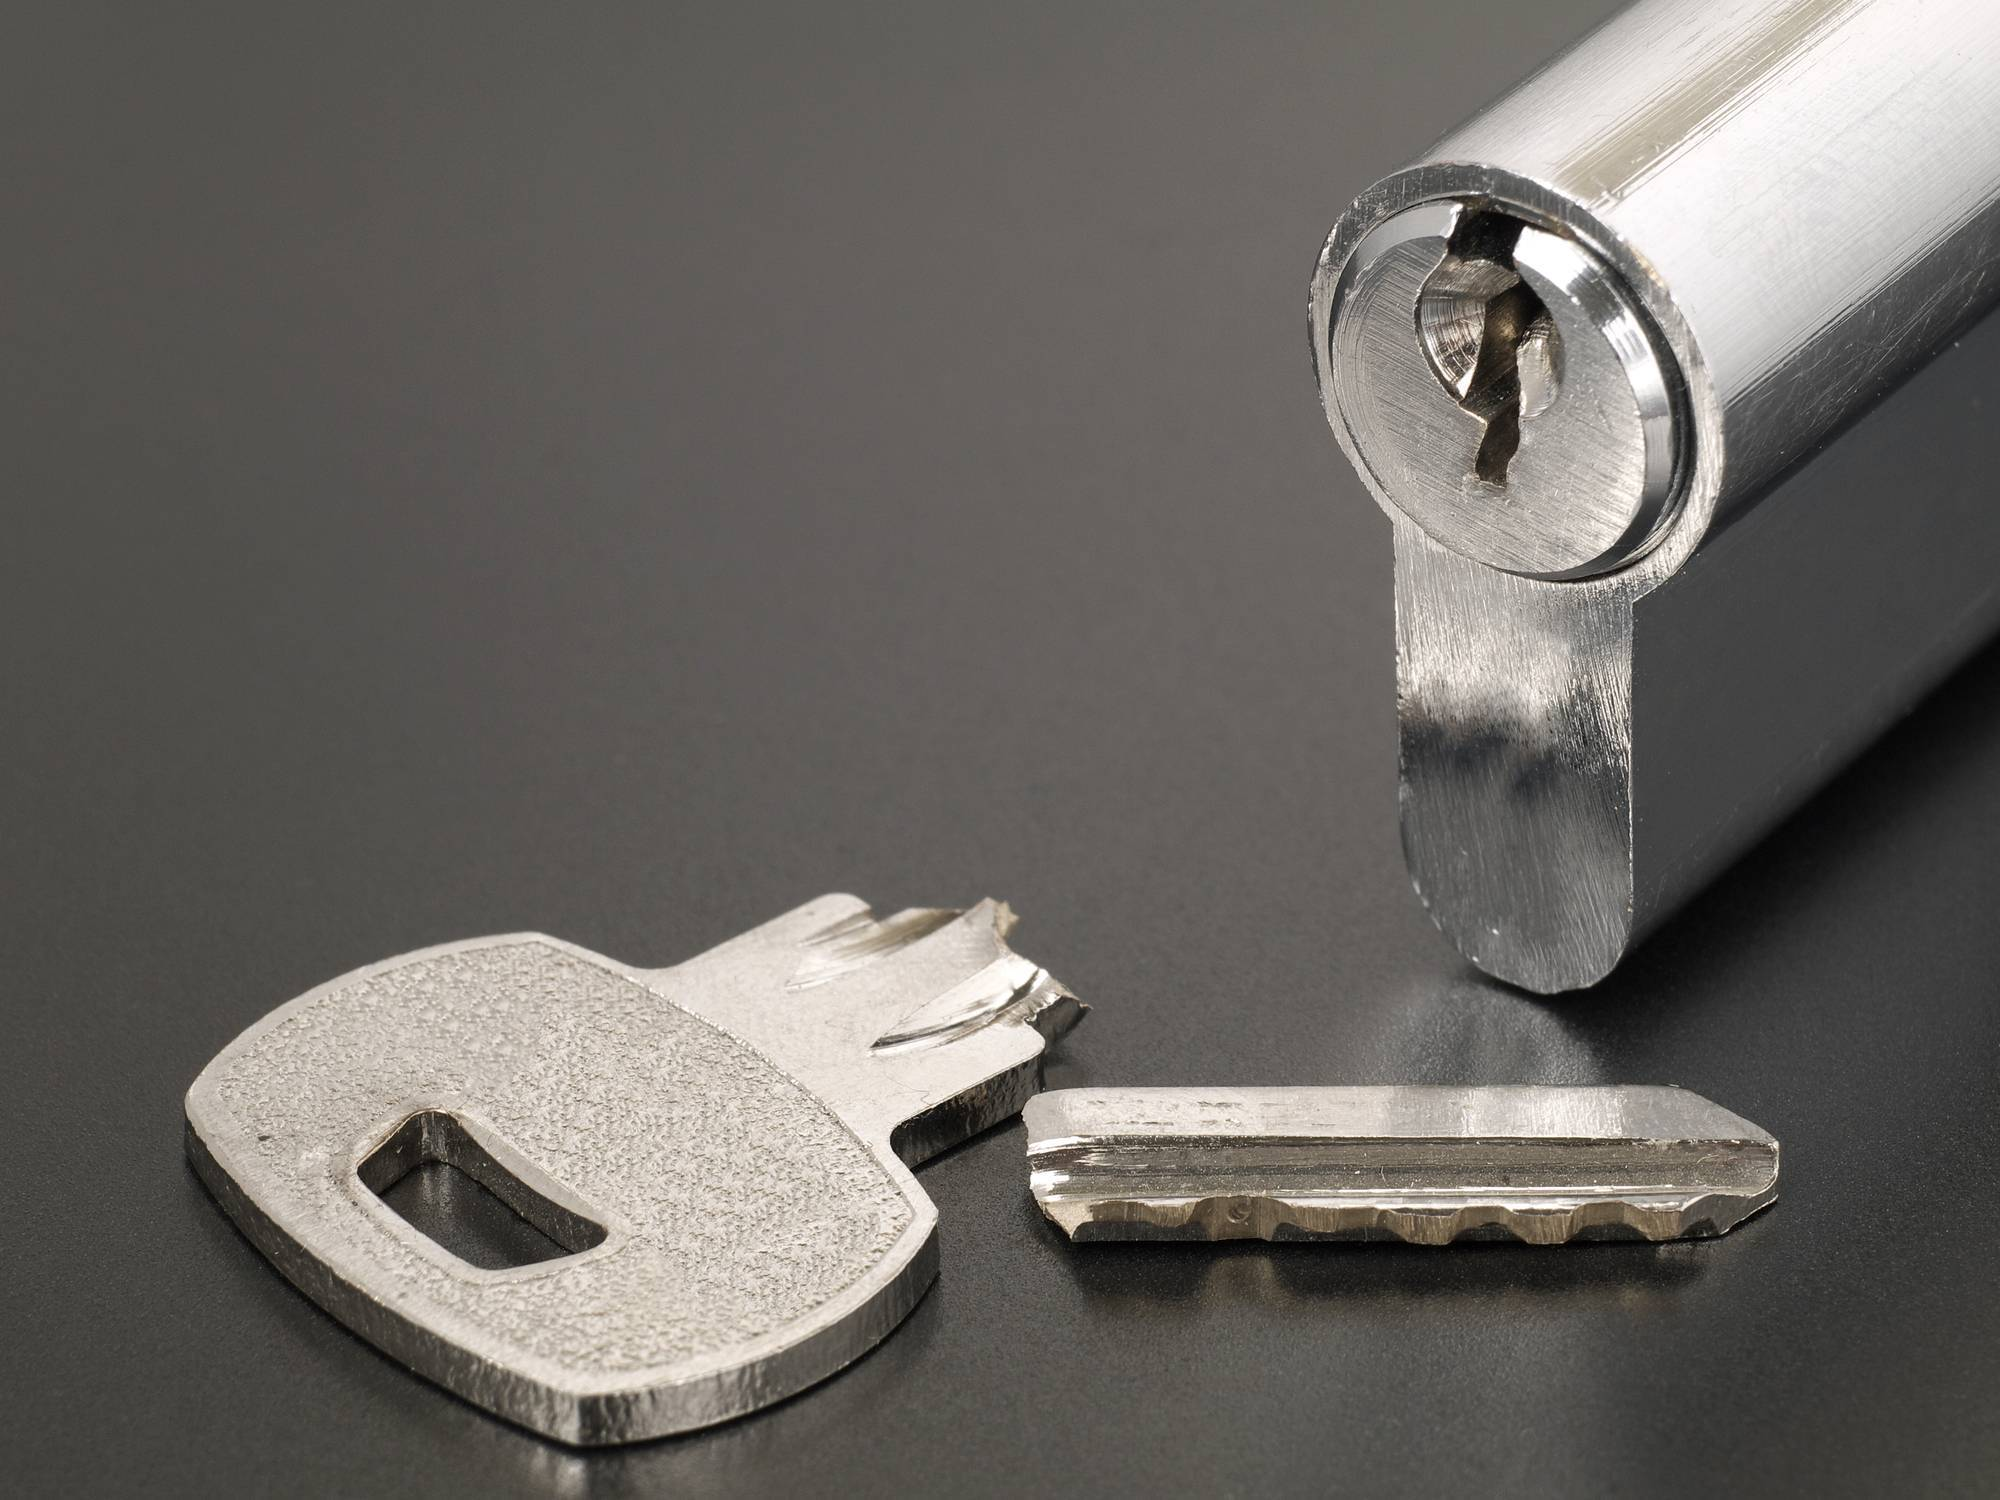 clé cassée serrurier intervention serrure